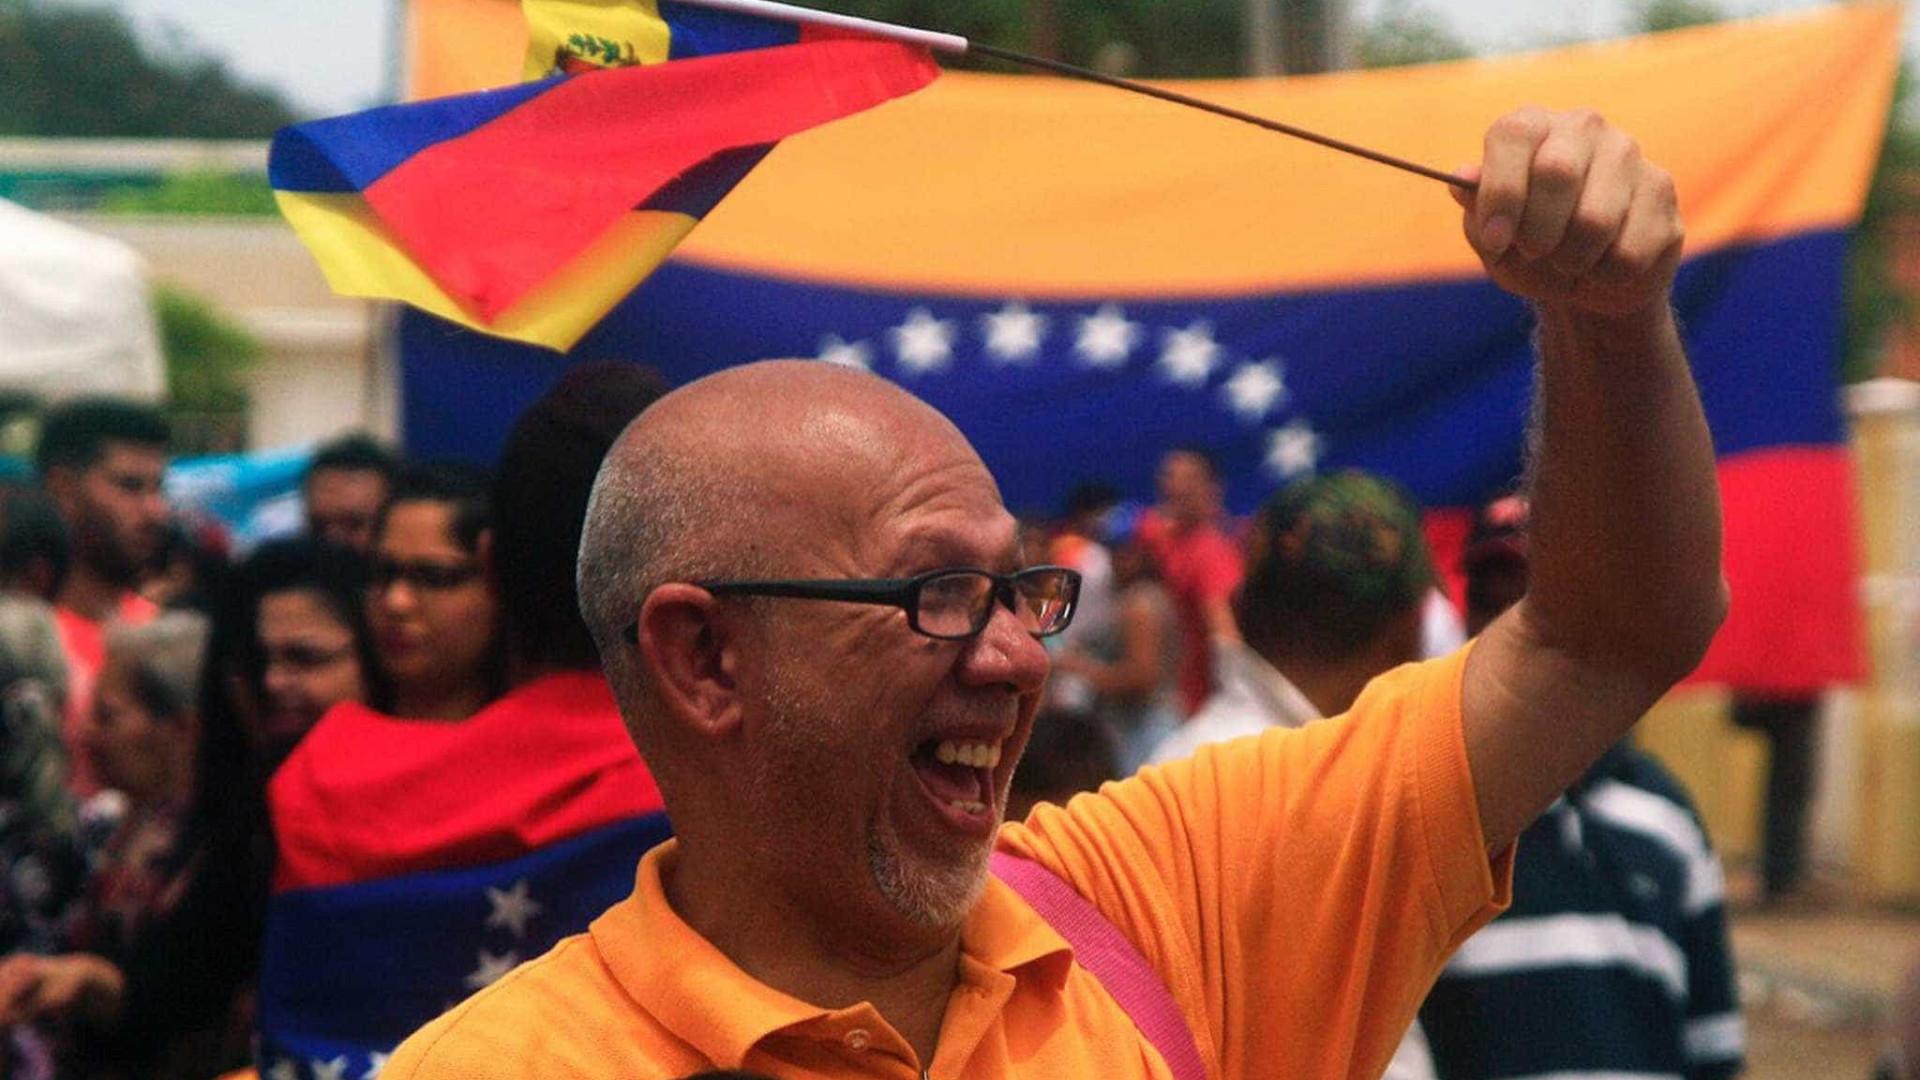 Estados Unidos advertem Caracas sobre medidas económicas fortes e rápidas